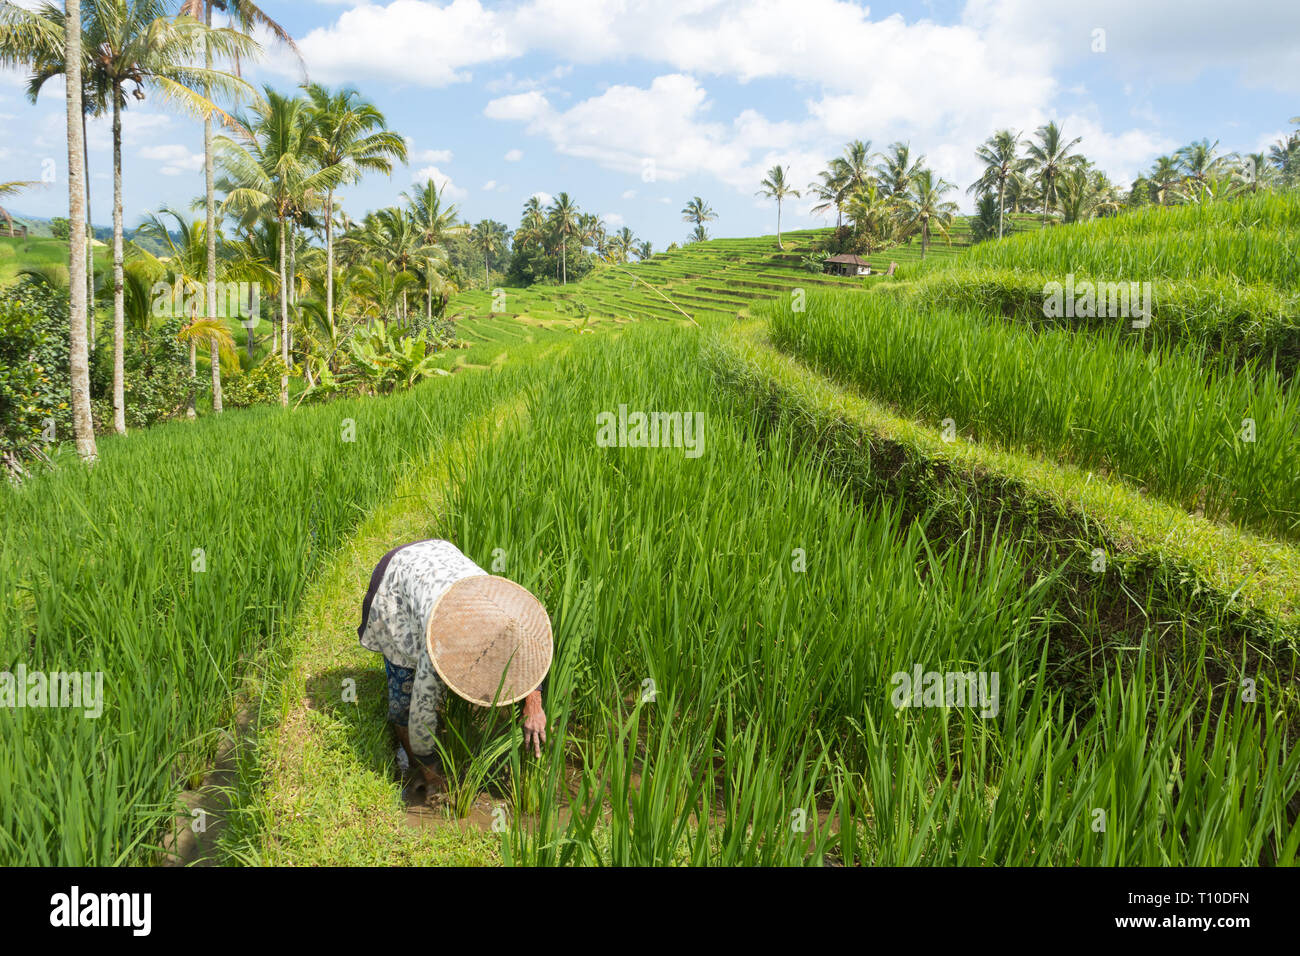 e2ecc6d9f Female farmer wearing traditional asian paddy hat working in beautiful  Jatiluwih rice terrace plantations on Bali